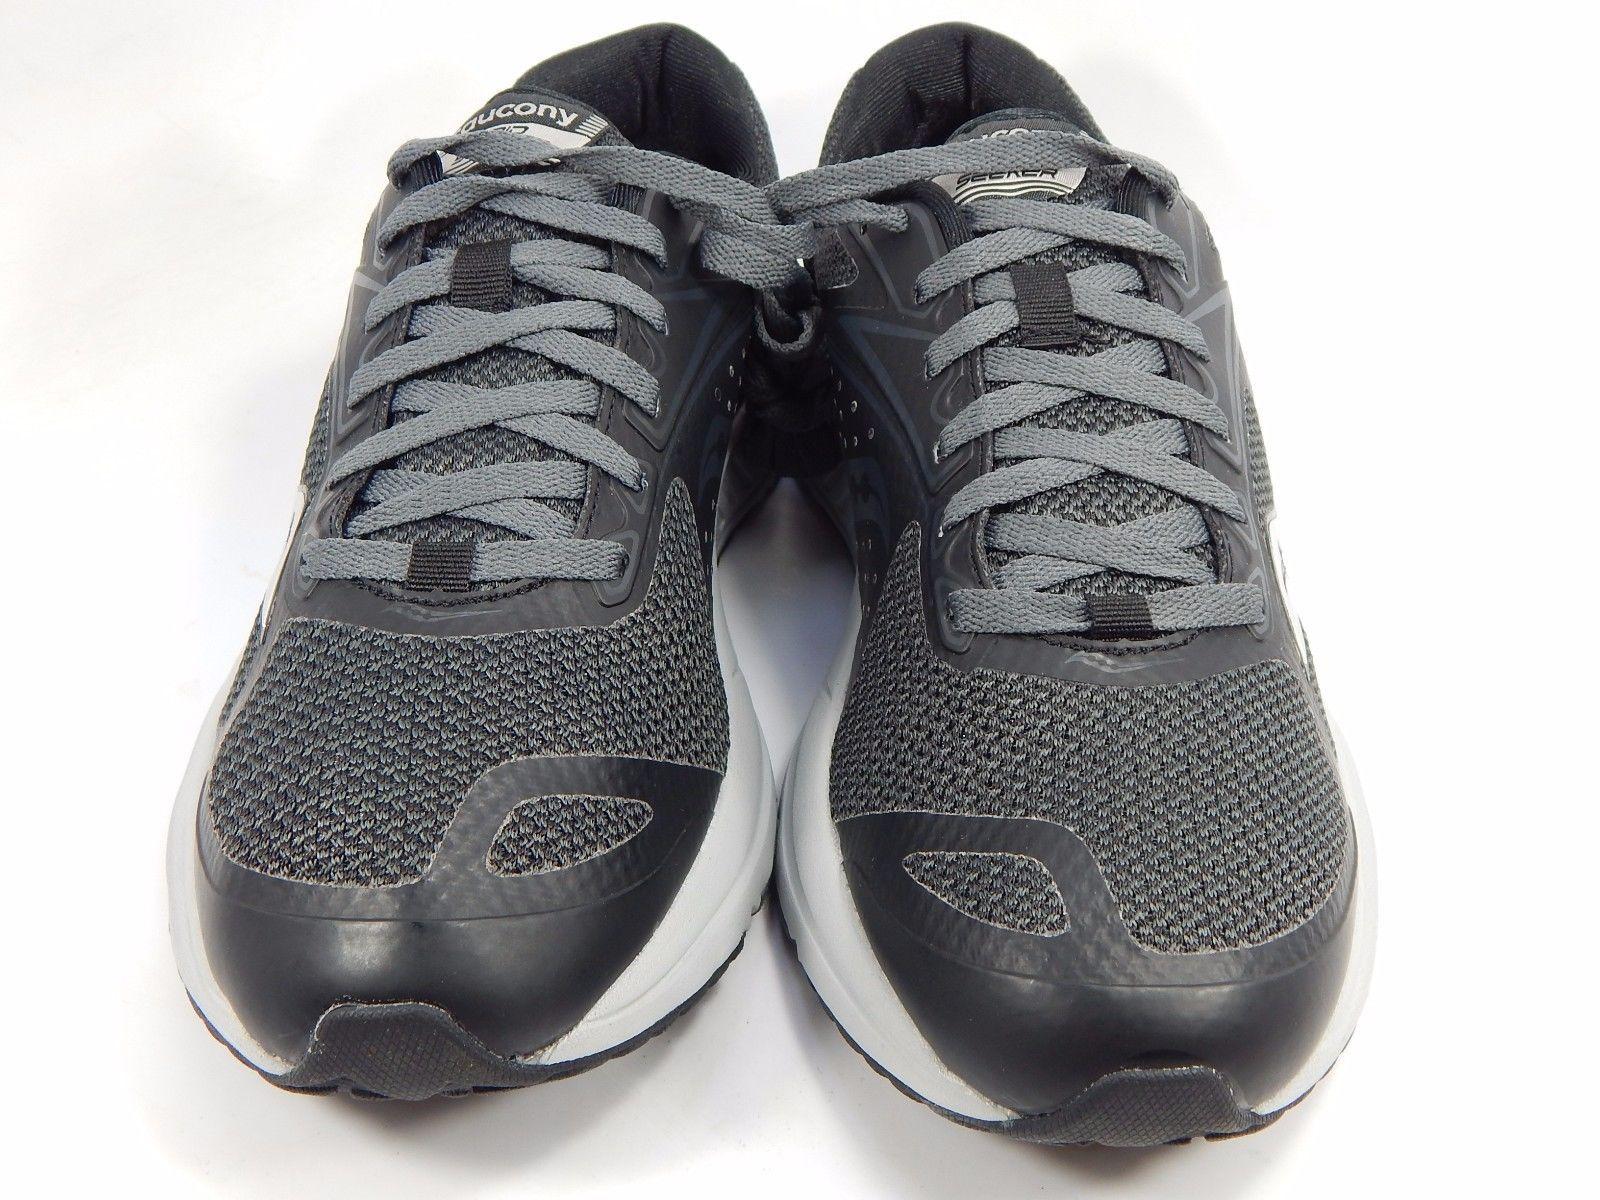 Saucony Grid Seeker Men's Running Shoes Se US 9 M (D) EU 42.5 Gray Red S25302-1